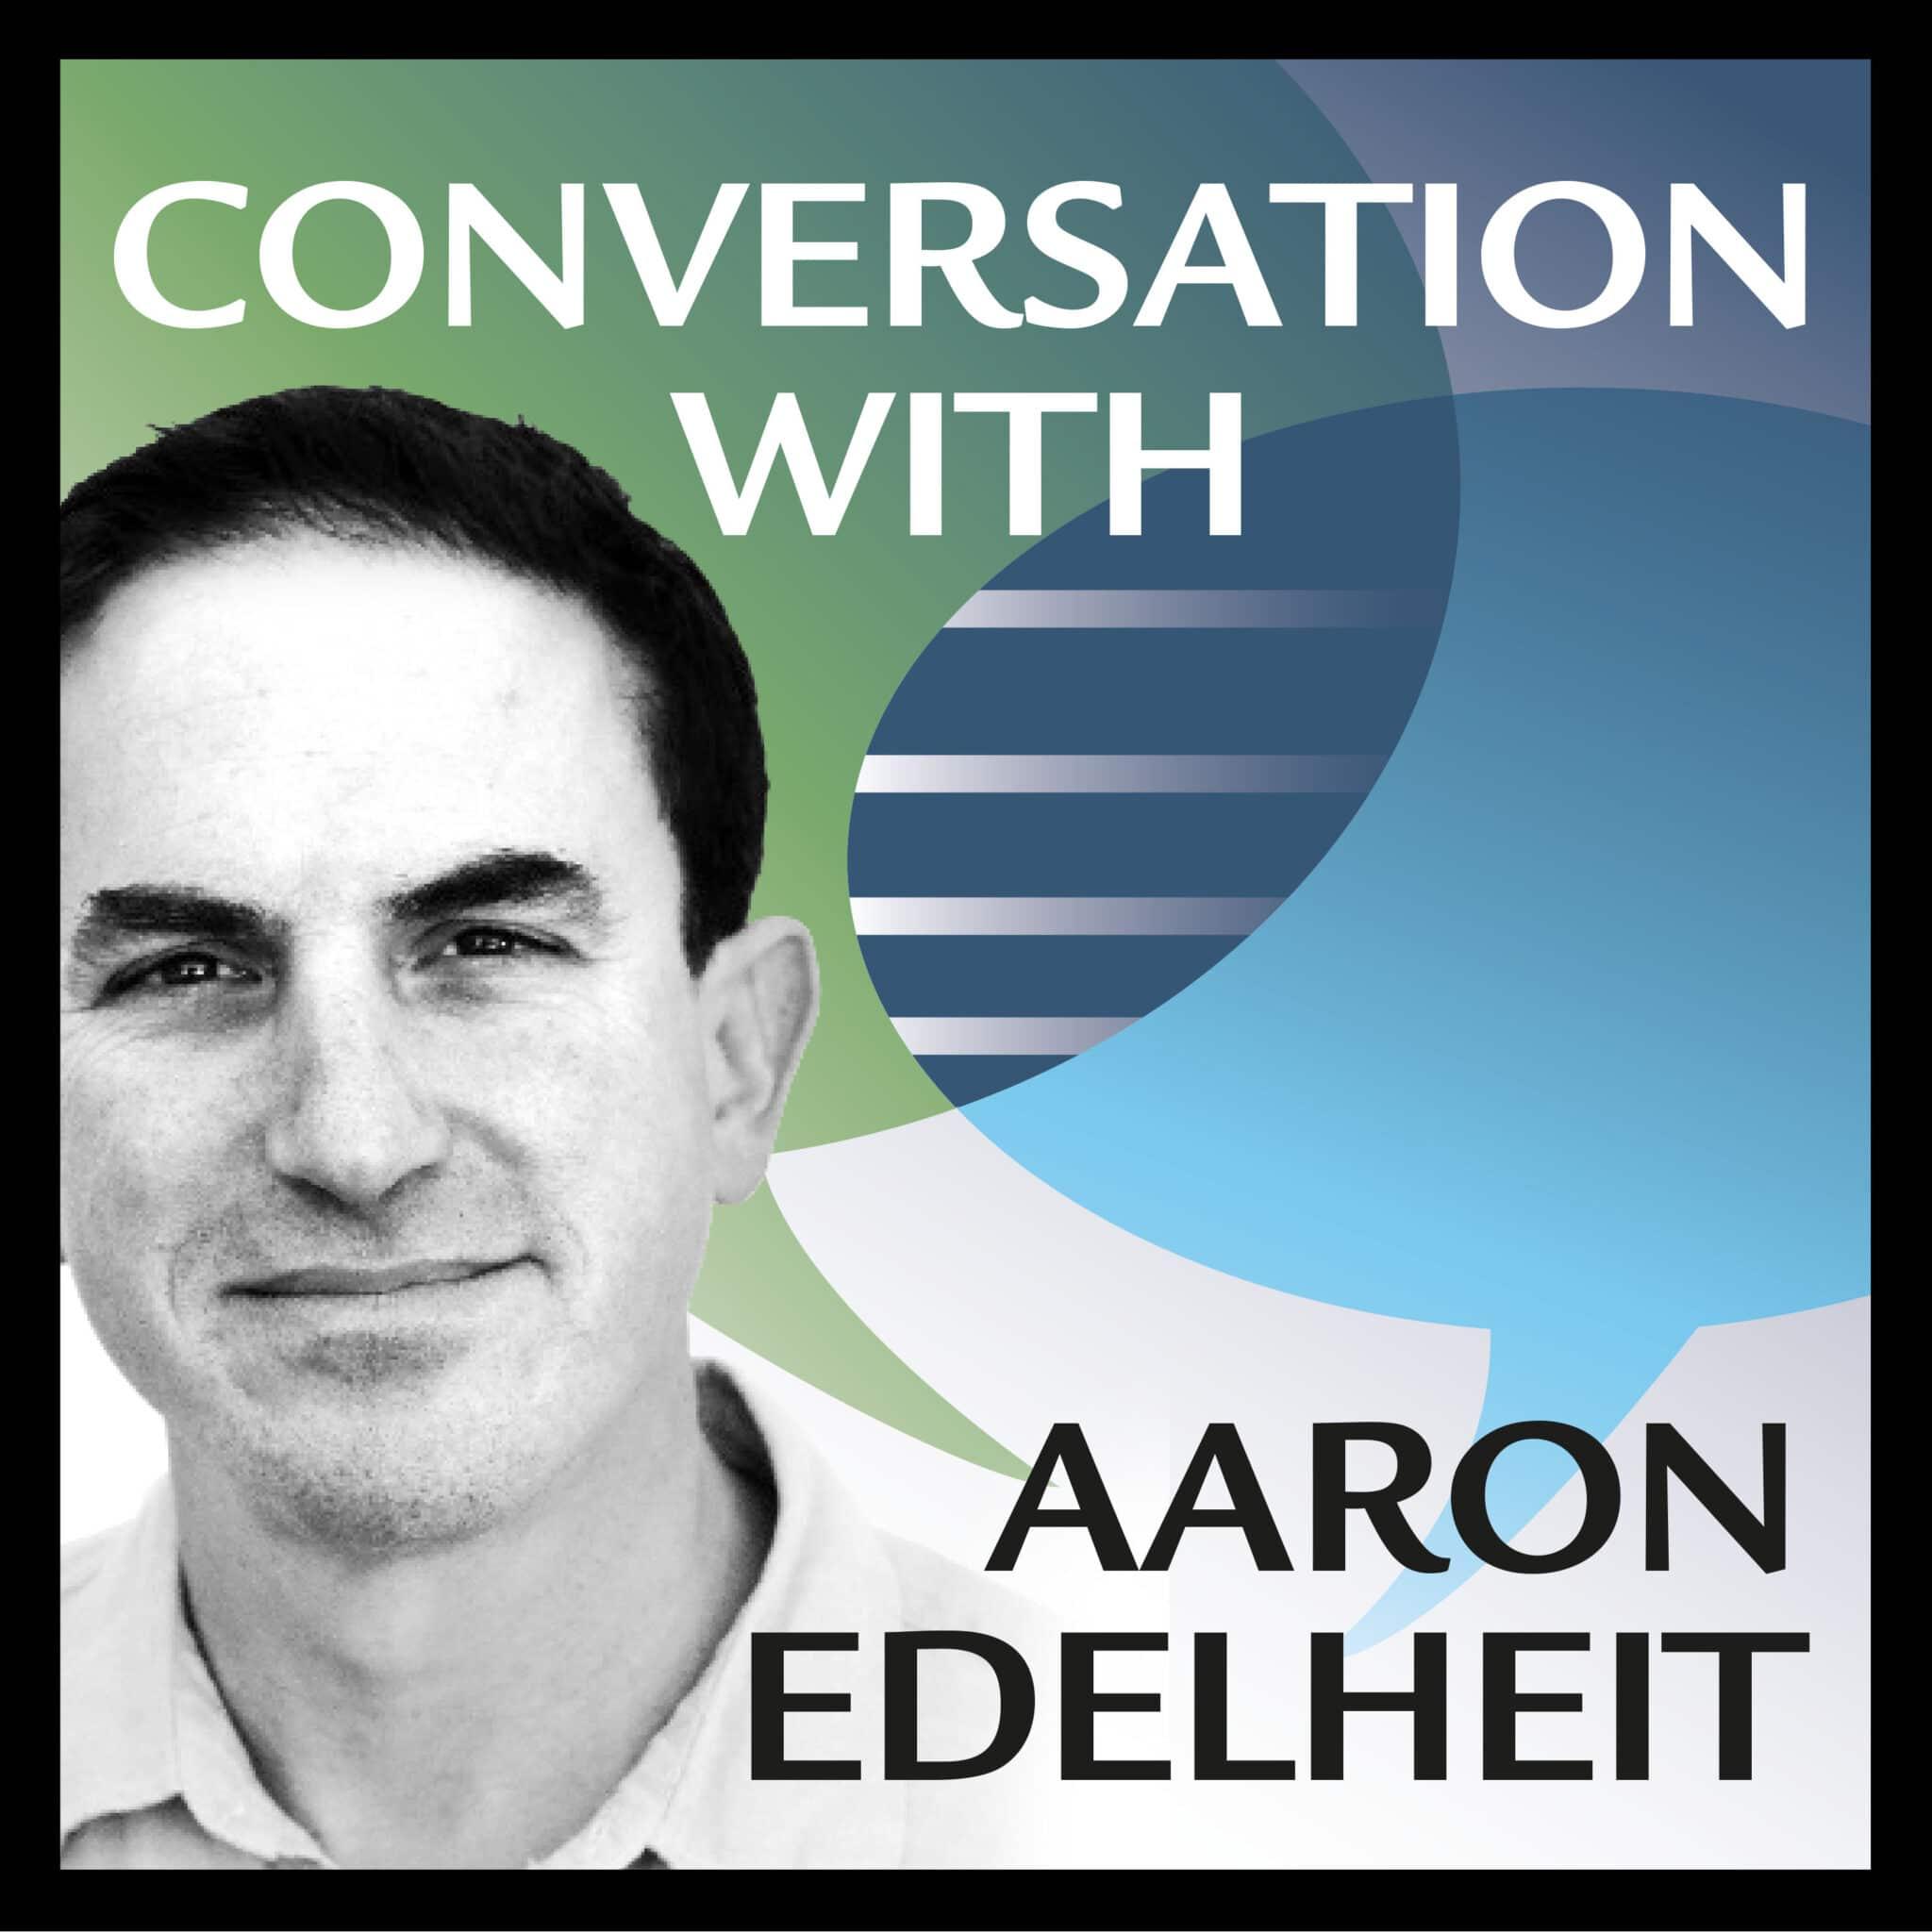 Aaron Edelheit: Twitter, the Sabbath and Chick fil-a